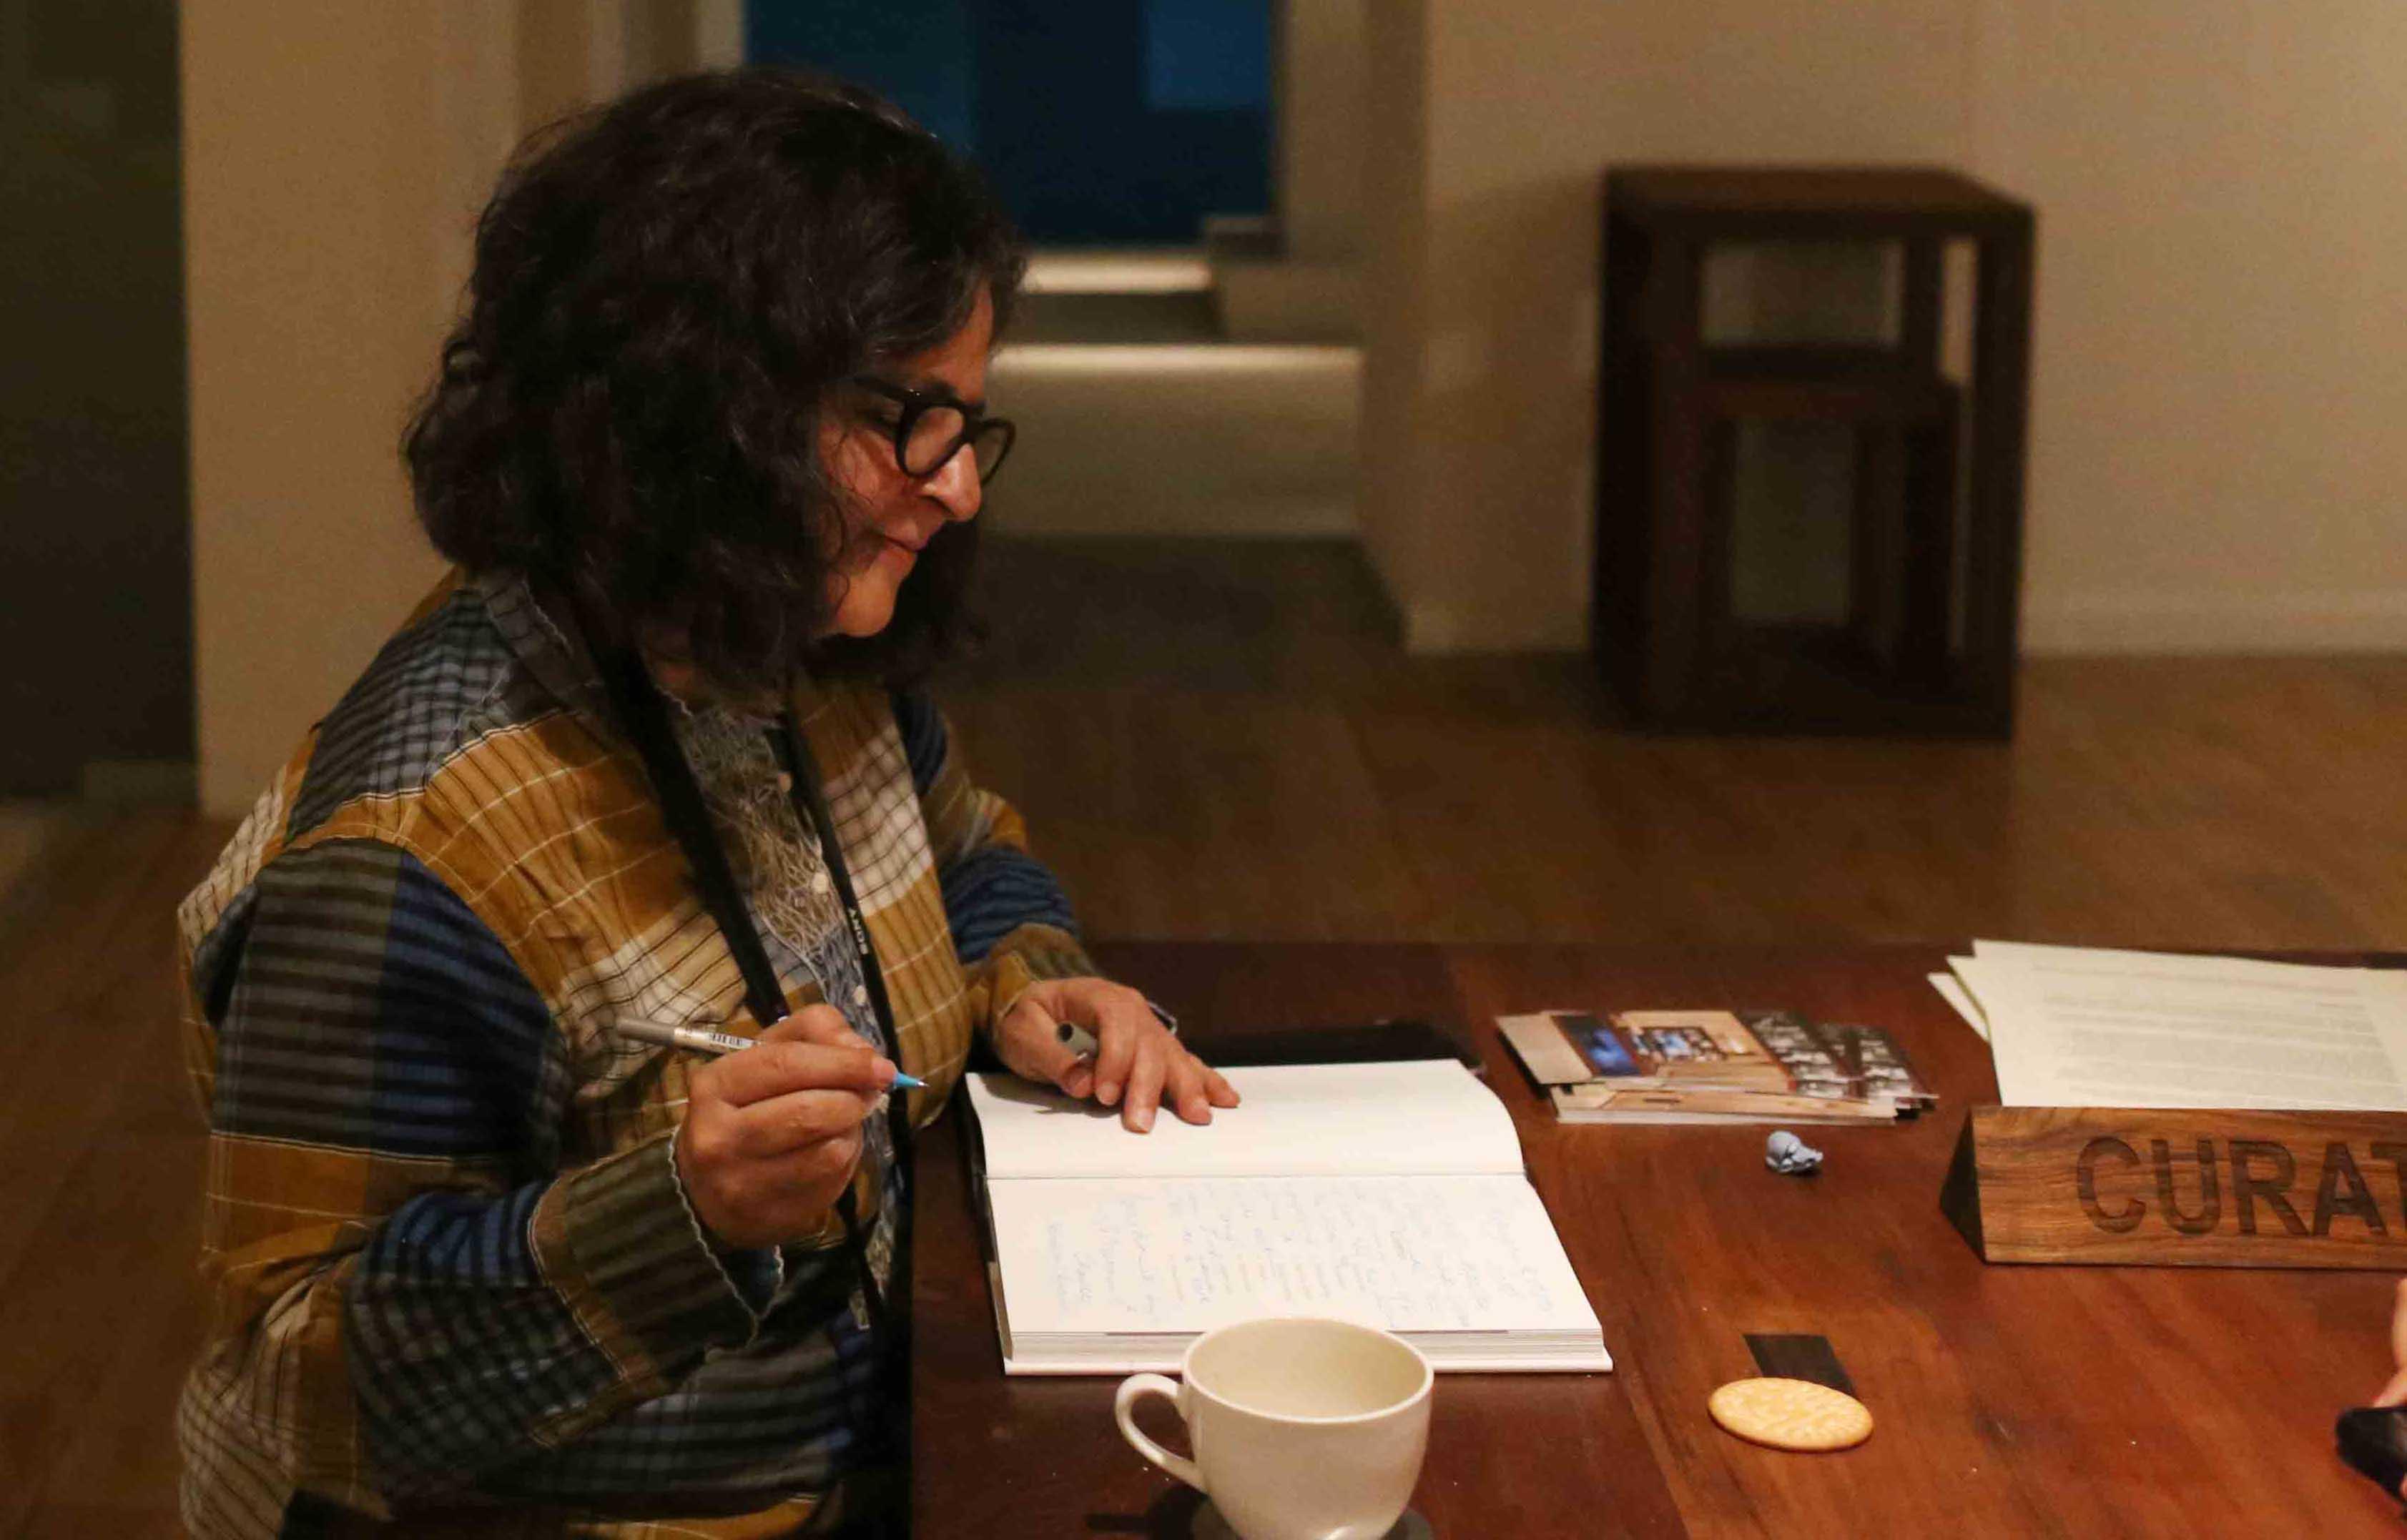 City Notice – Artist Dayanita Singh's Gift To The Delhi Walla Website, Museum of Chance